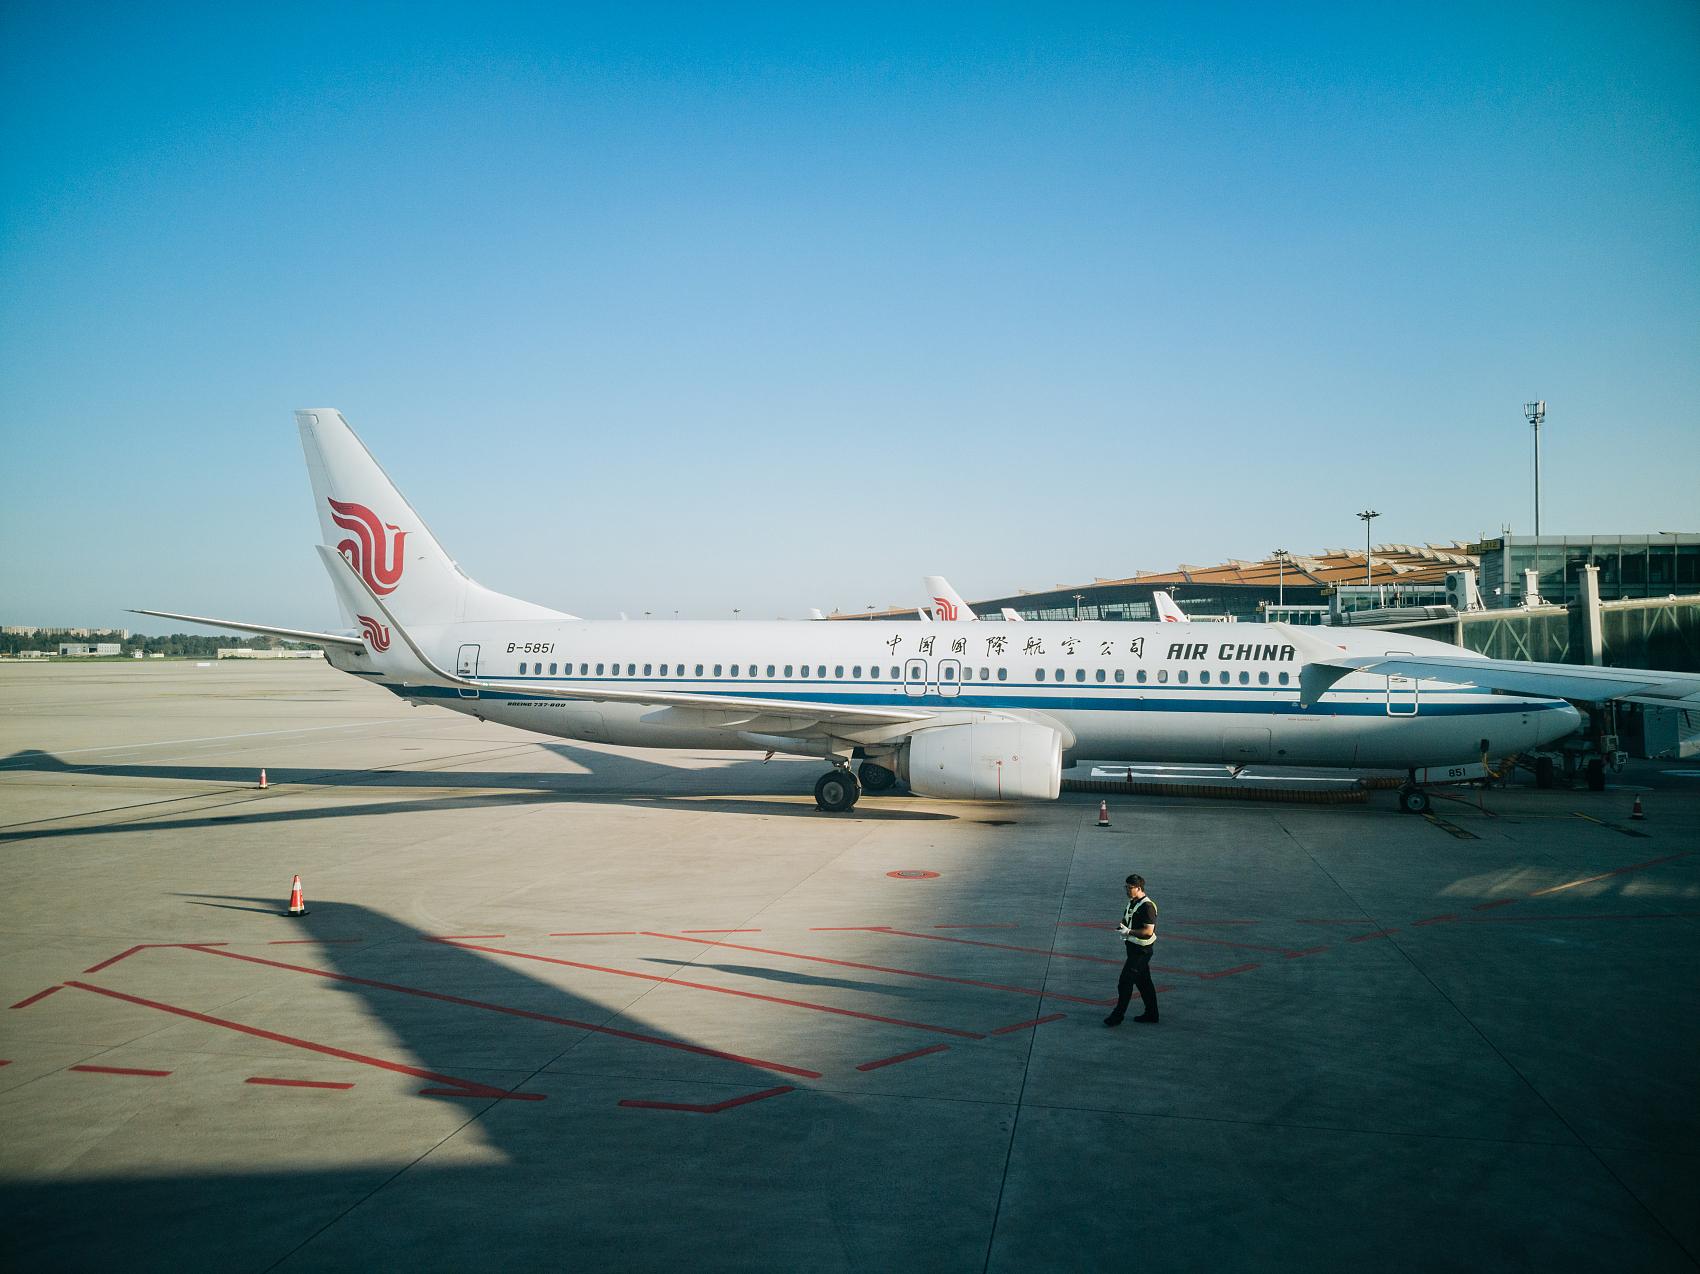 China's Civil Aviation Authority suspends flights to curb coronavirus spread